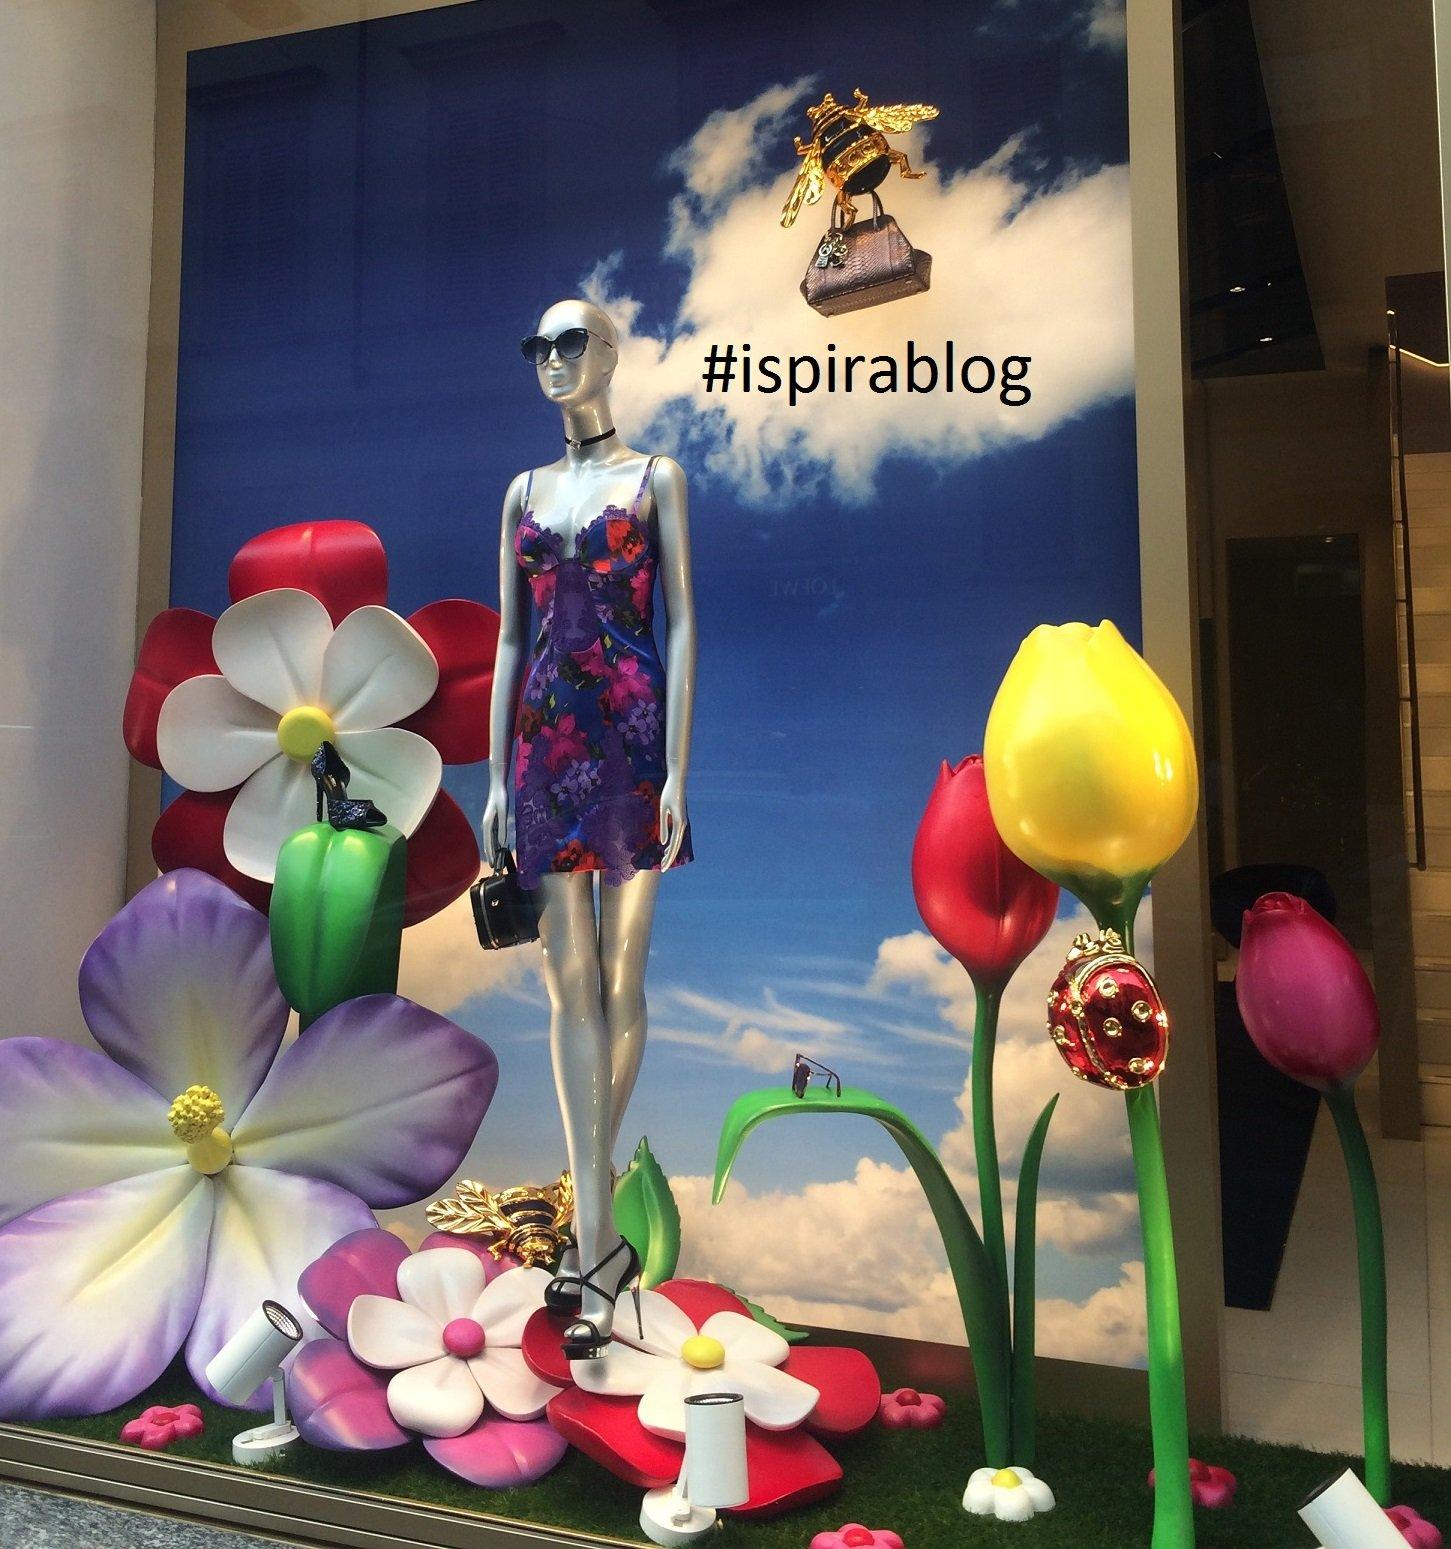 ... La Perla - Milan - Summer 2017 - Womenswear Collection - blue short dress with black sandals and small handbag 2017-07-19 ...